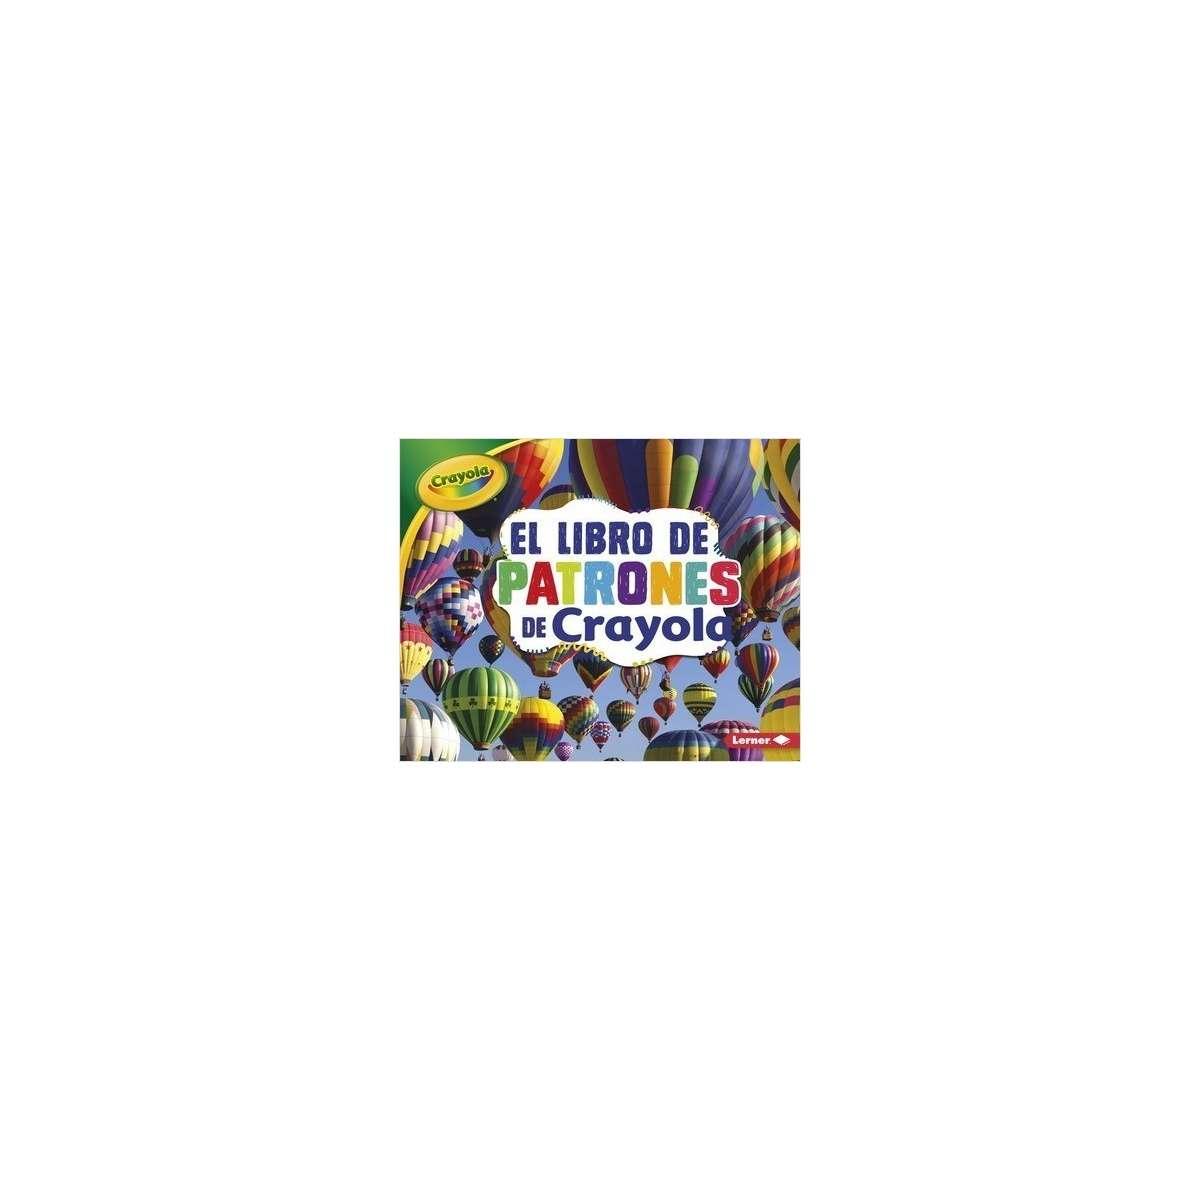 Crayola 174 Concepts Set Of All 6 Books Spanish Lpb1541555058